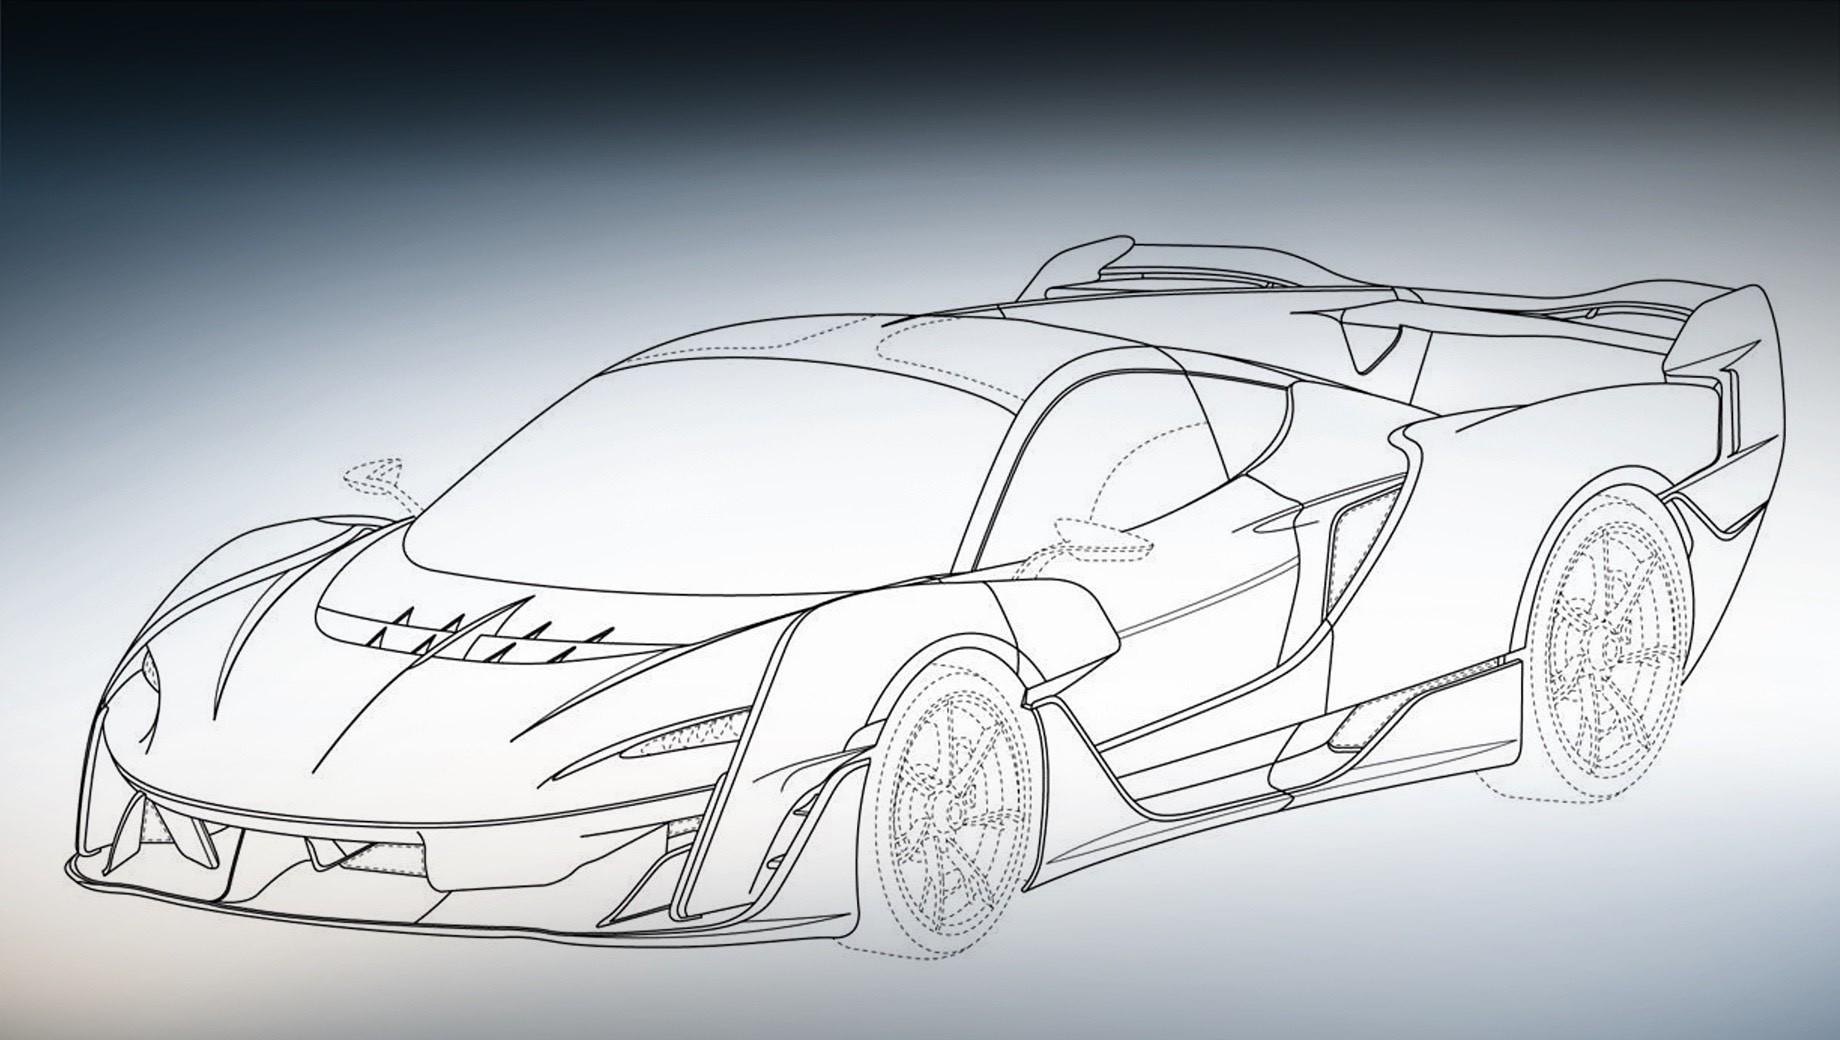 McLaren Sabre окажется бензоэлектрическим гиперкаром